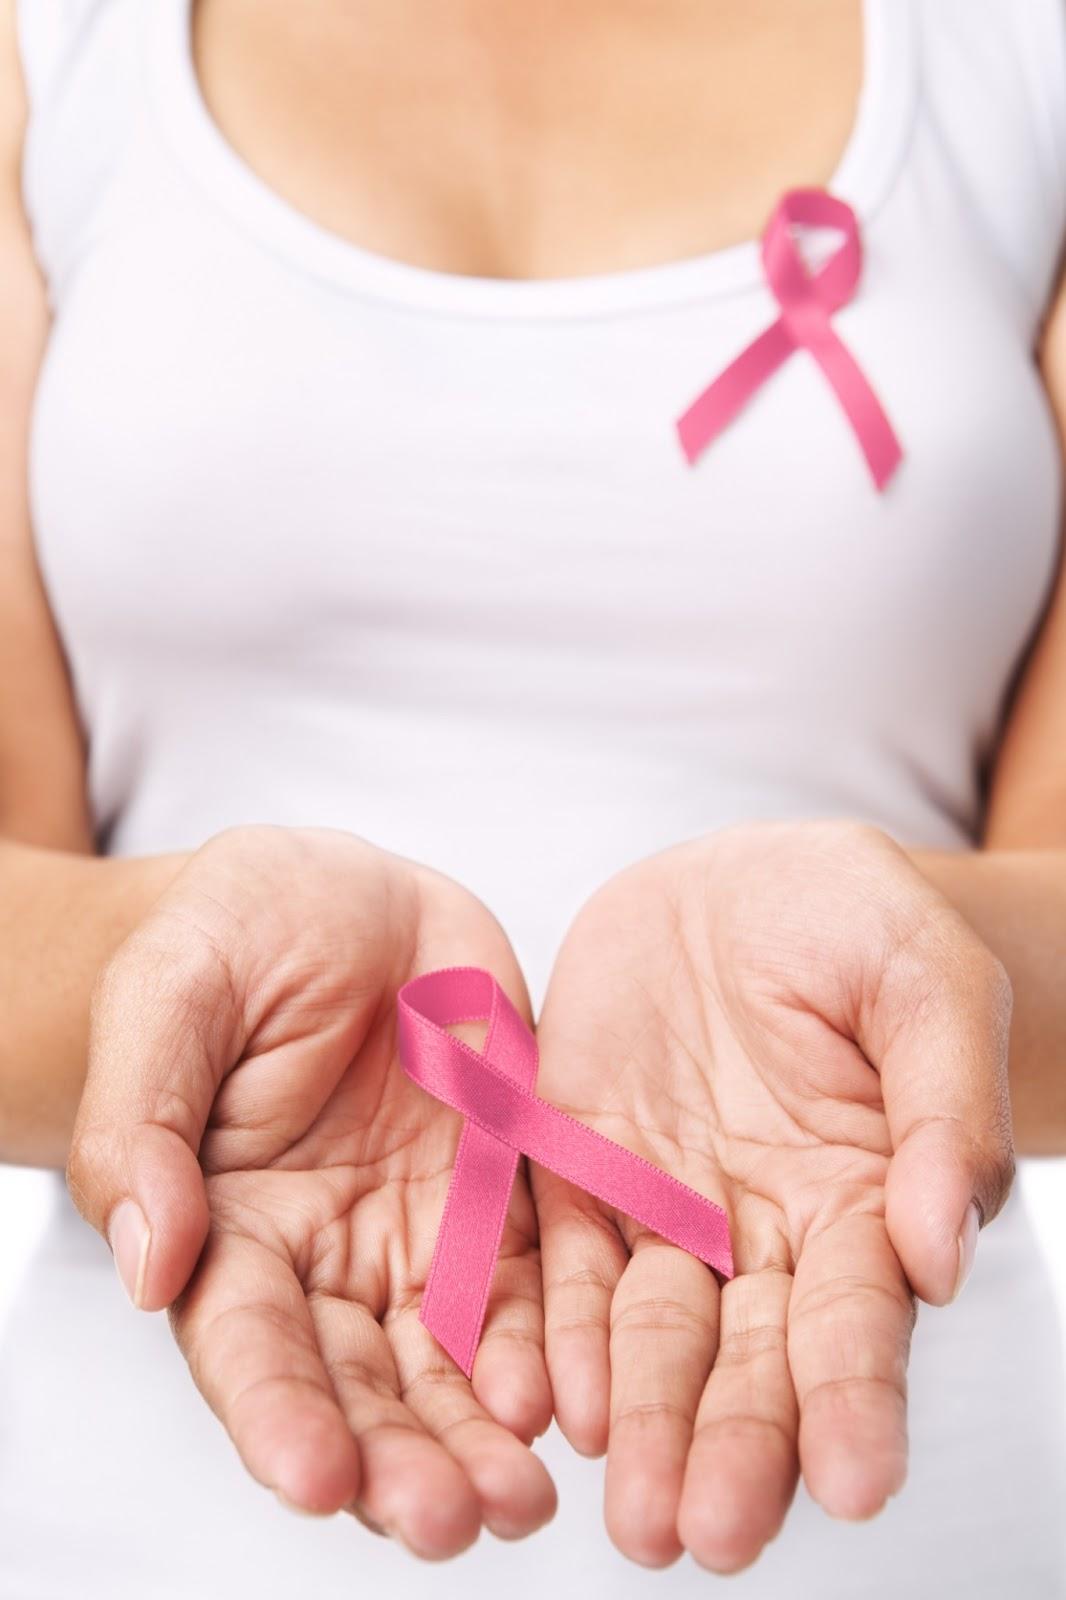 https://4.bp.blogspot.com/-lmRaK7ar7Yo/WMoqjMalF3I/AAAAAAAAAYs/bsIlWNO-3sY8zAKJiy8KOqdRgbojrQtOACLcB/s1600/kanker-payudara%2Basli.jpg